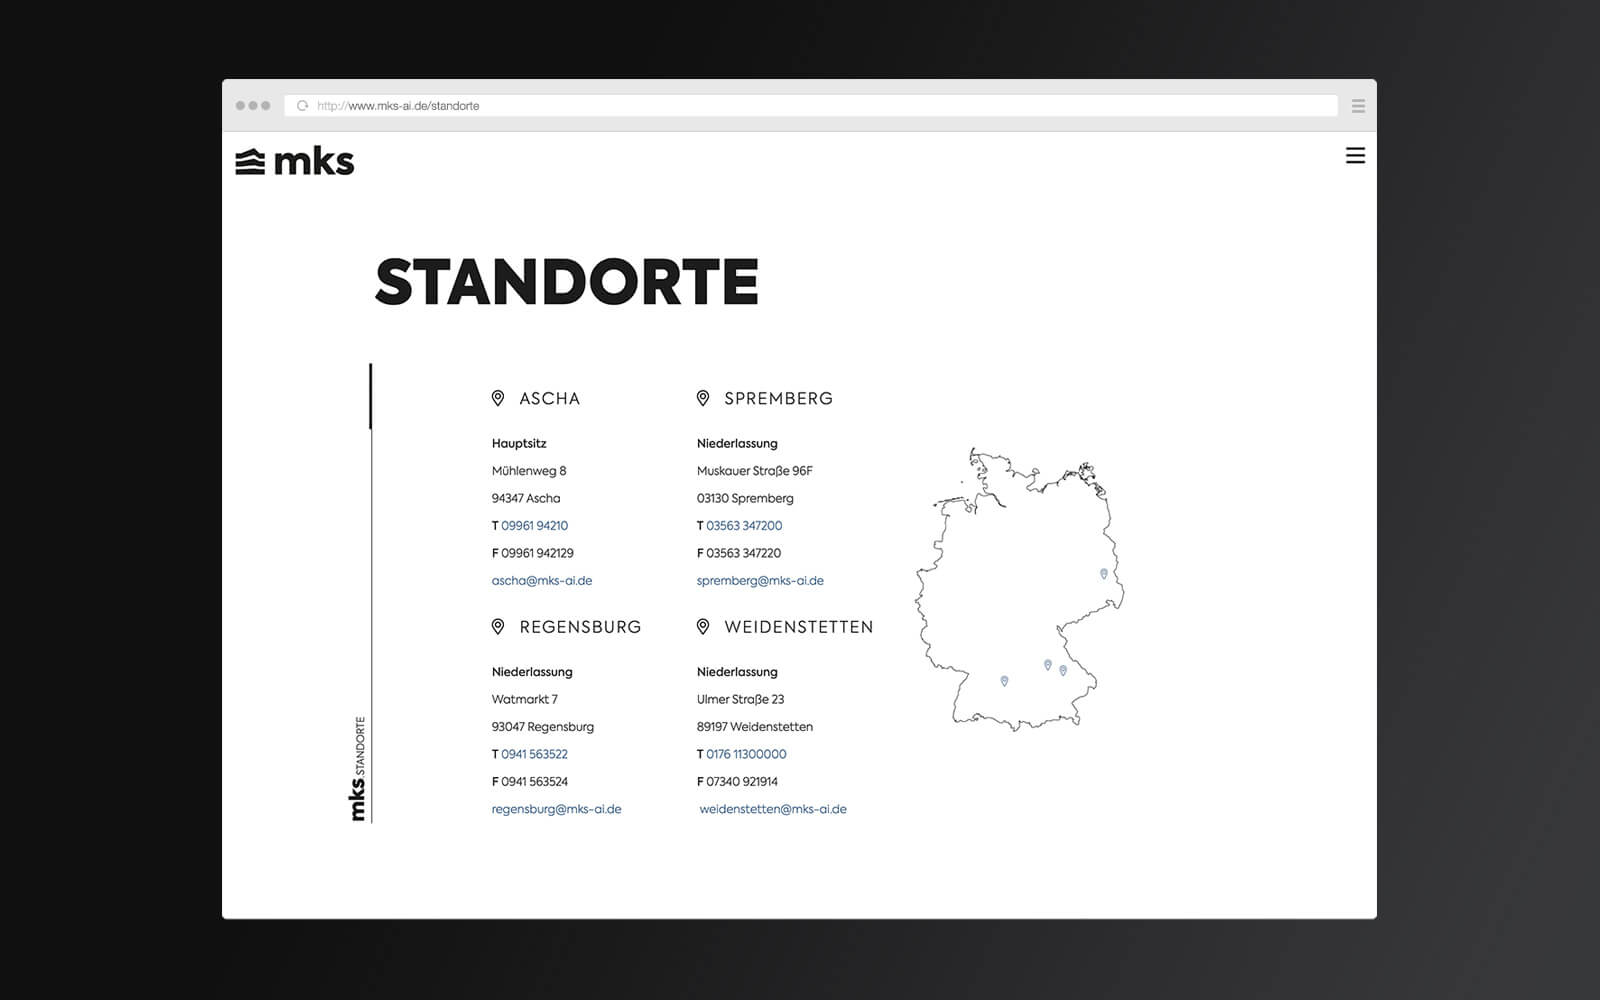 mks – Website Standorte